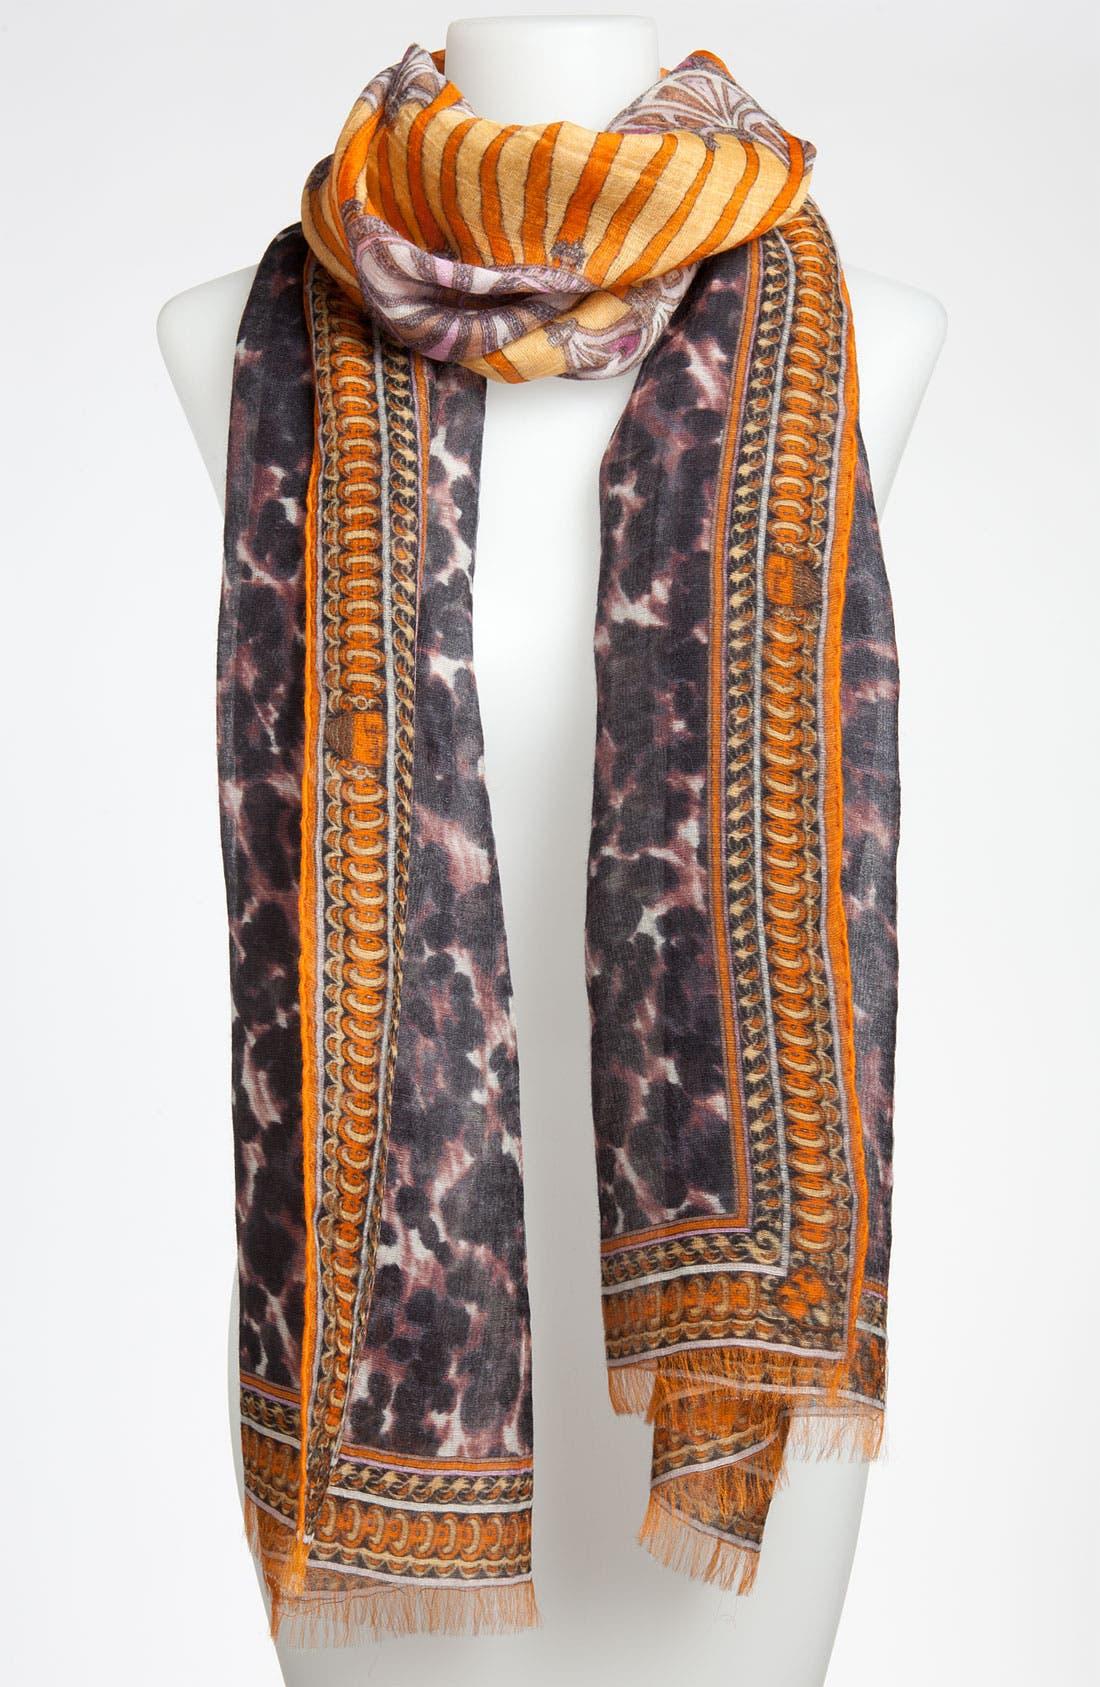 Alternate Image 1 Selected - Emilio Pucci 'Porticato' Cashmere Blend Scarf